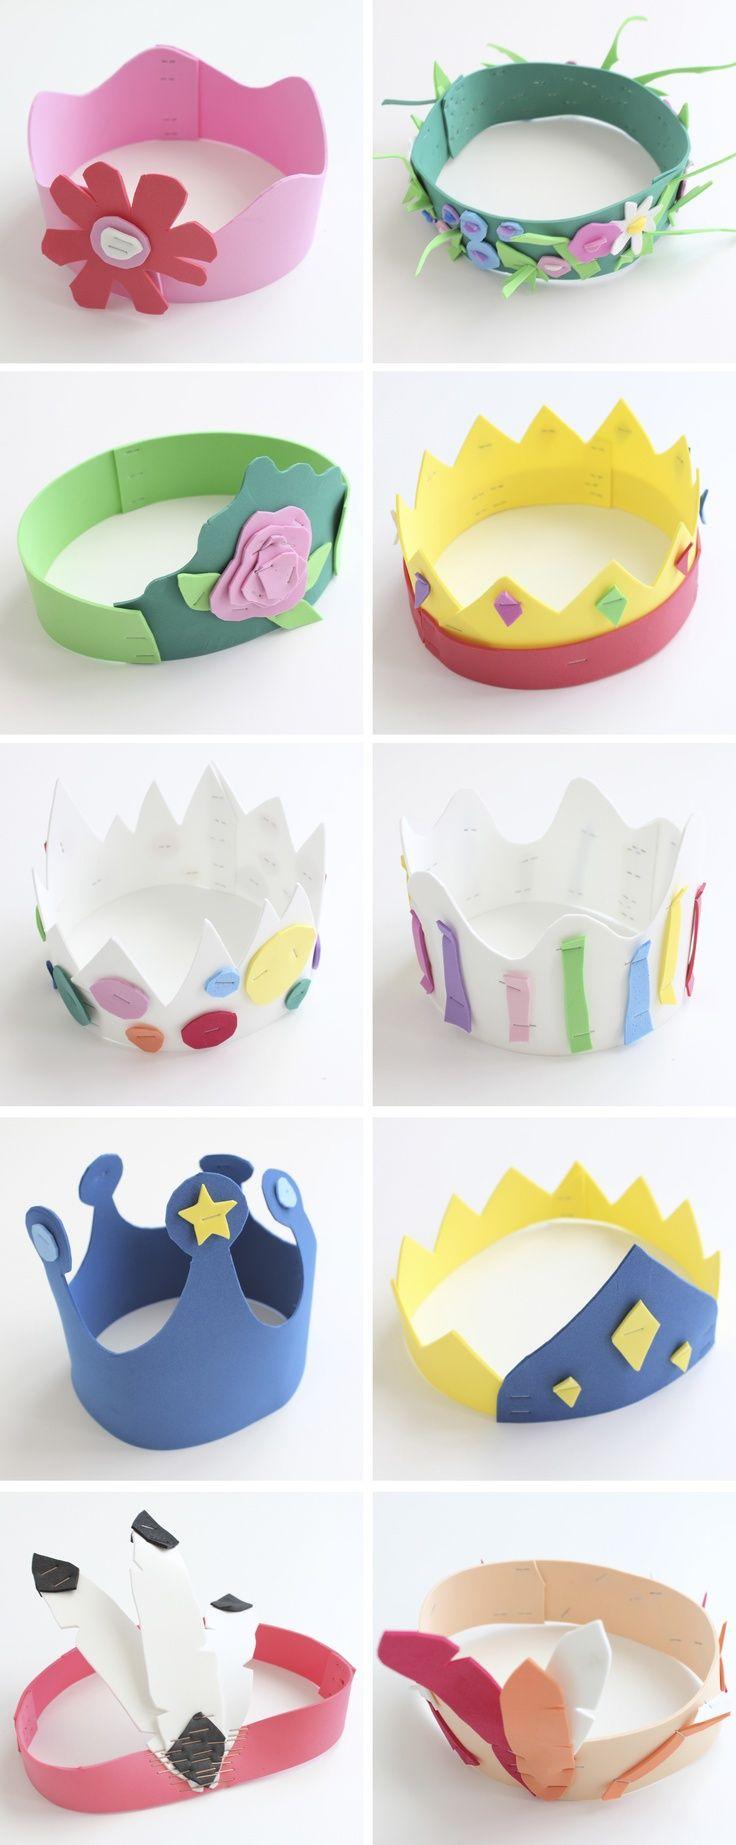 EVA foam crowns. Cute idea for story time!